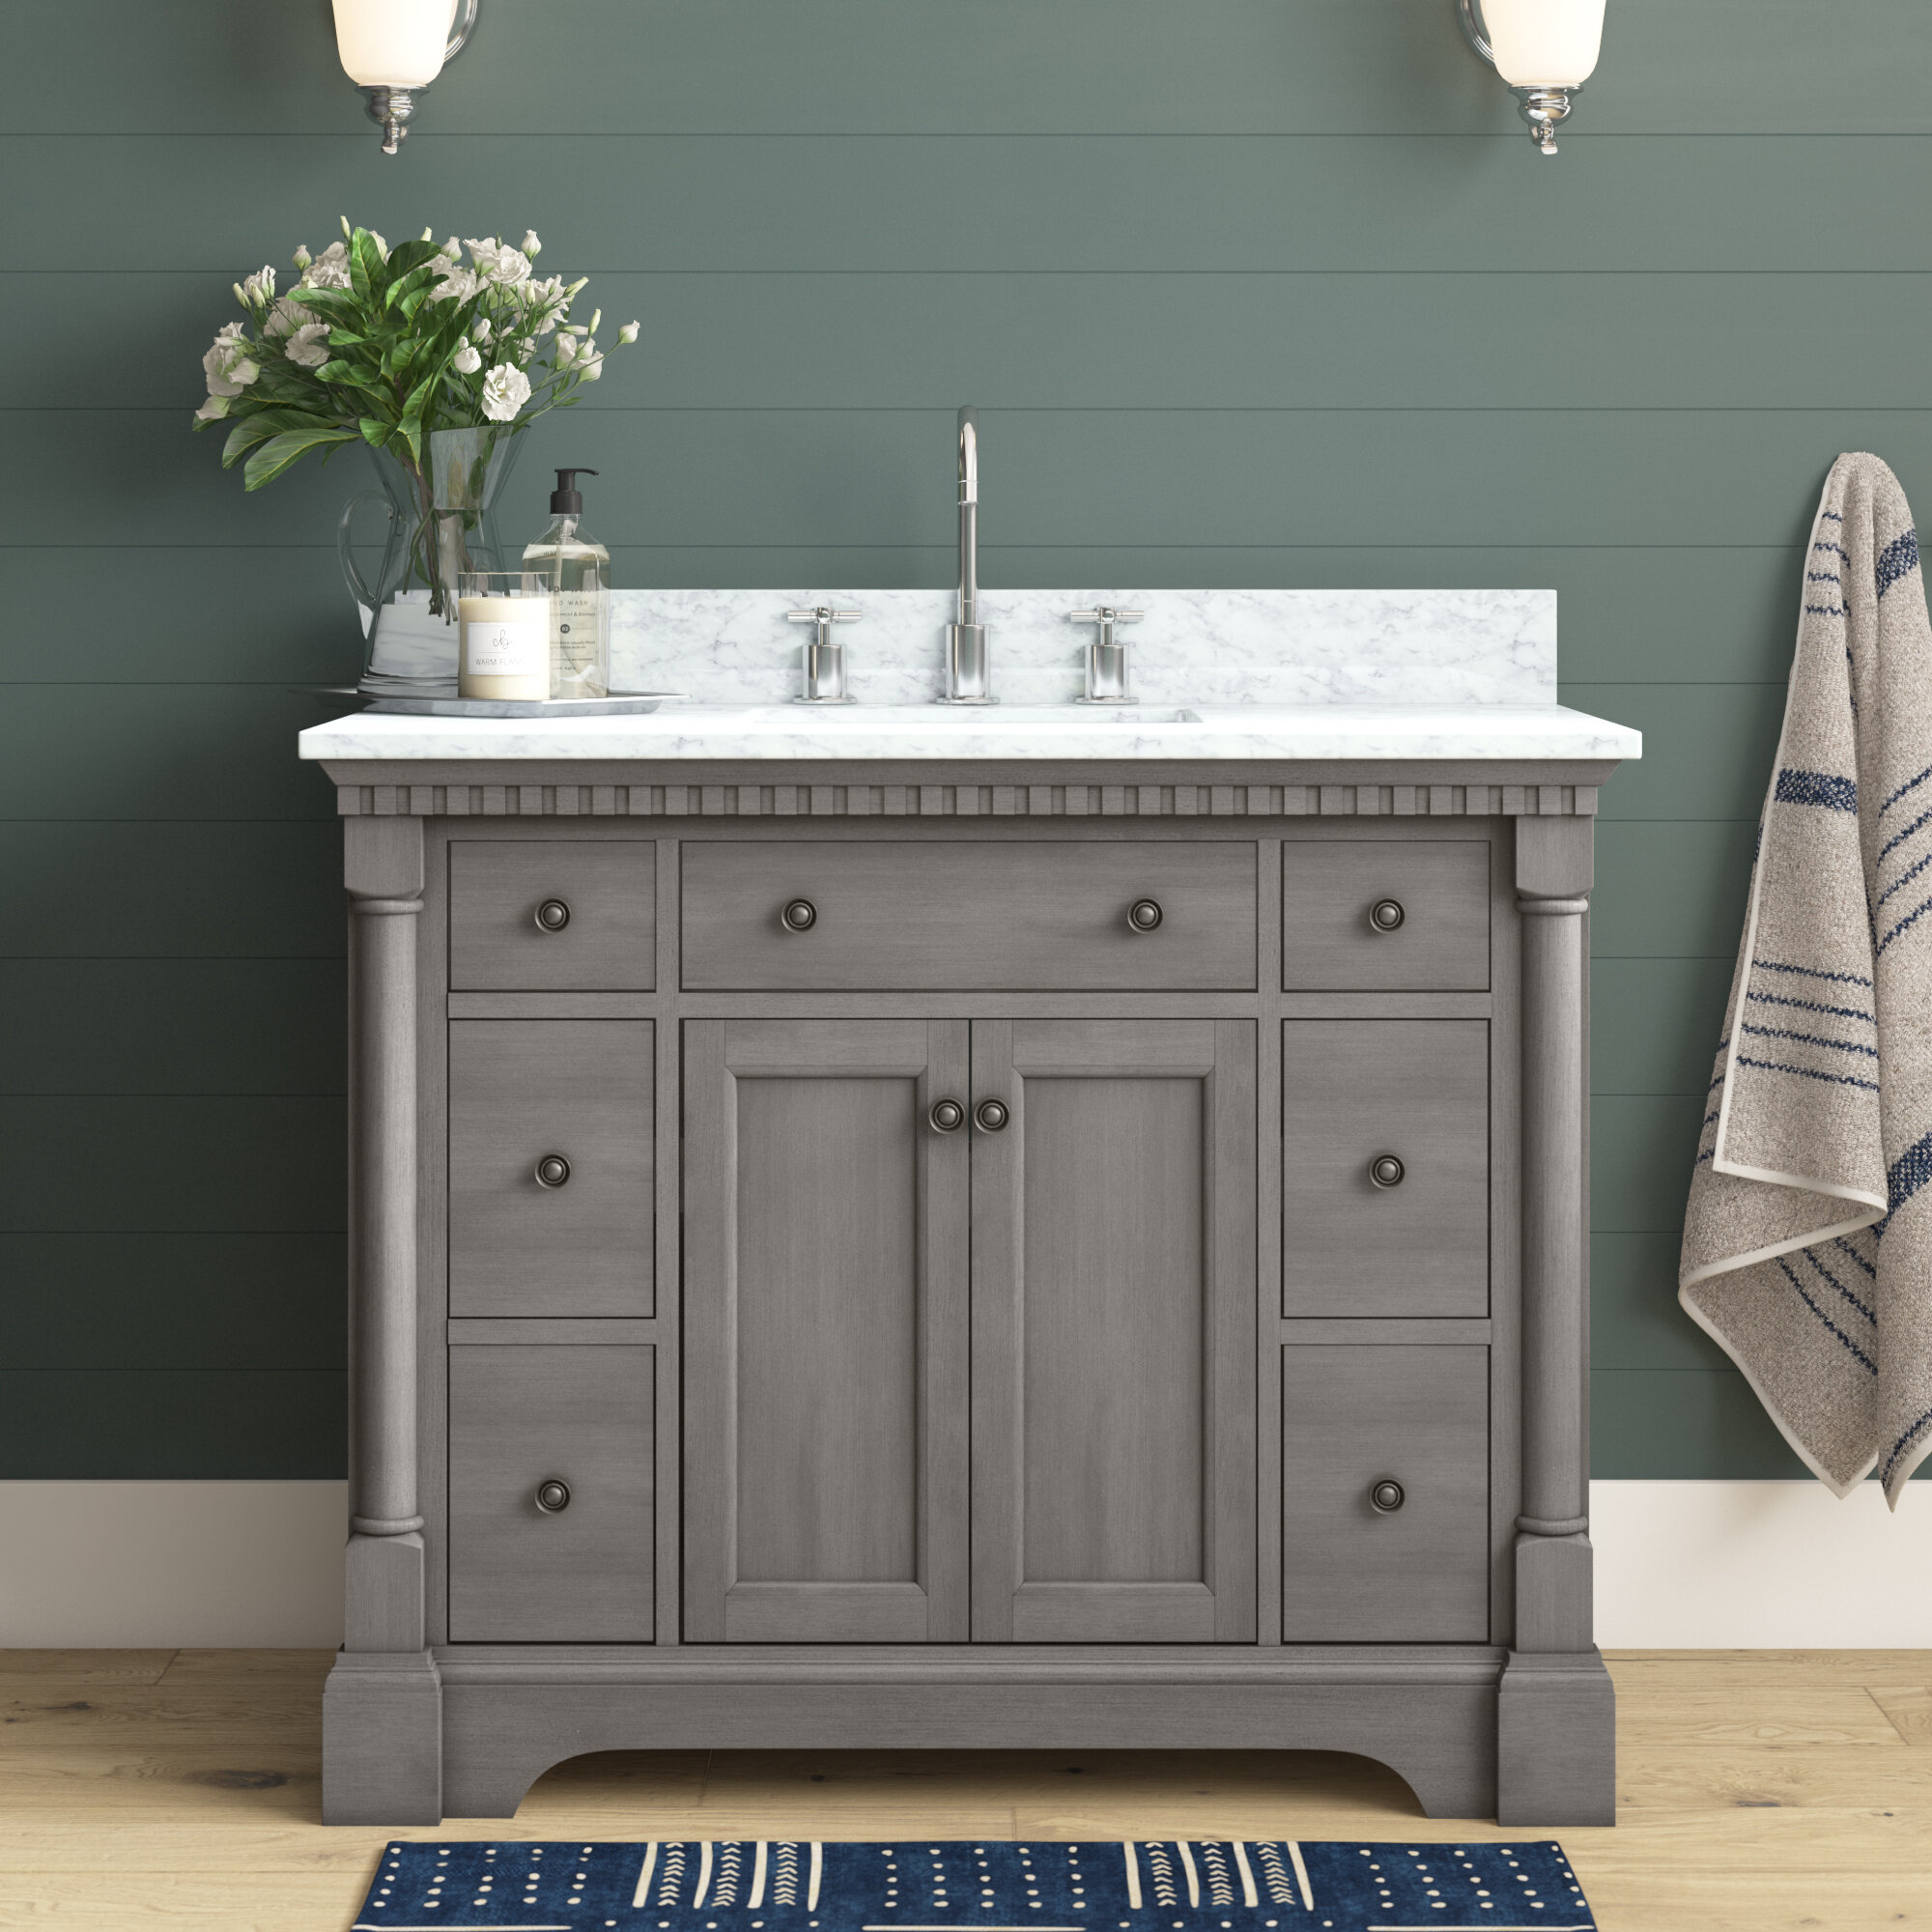 42 Inch Gray Wood Bathroom Vanities You Ll Love In 2021 Wayfair